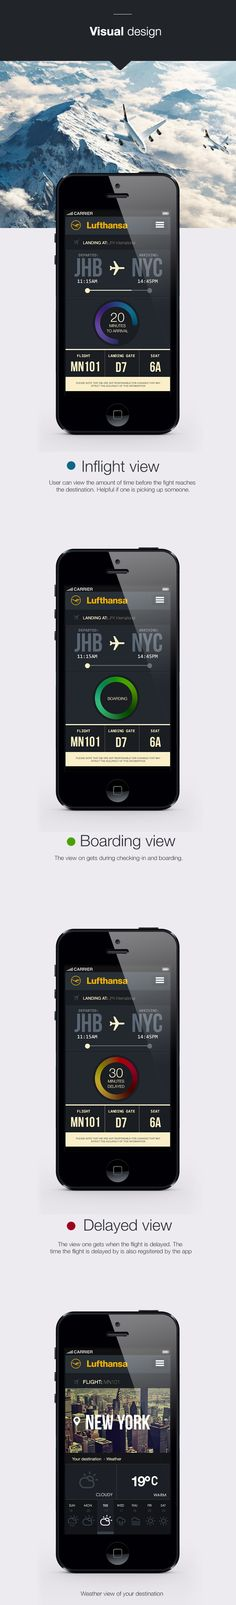 Lufthansa flight tracking #app #IOS7 on Behance #ui #visual #design #interface